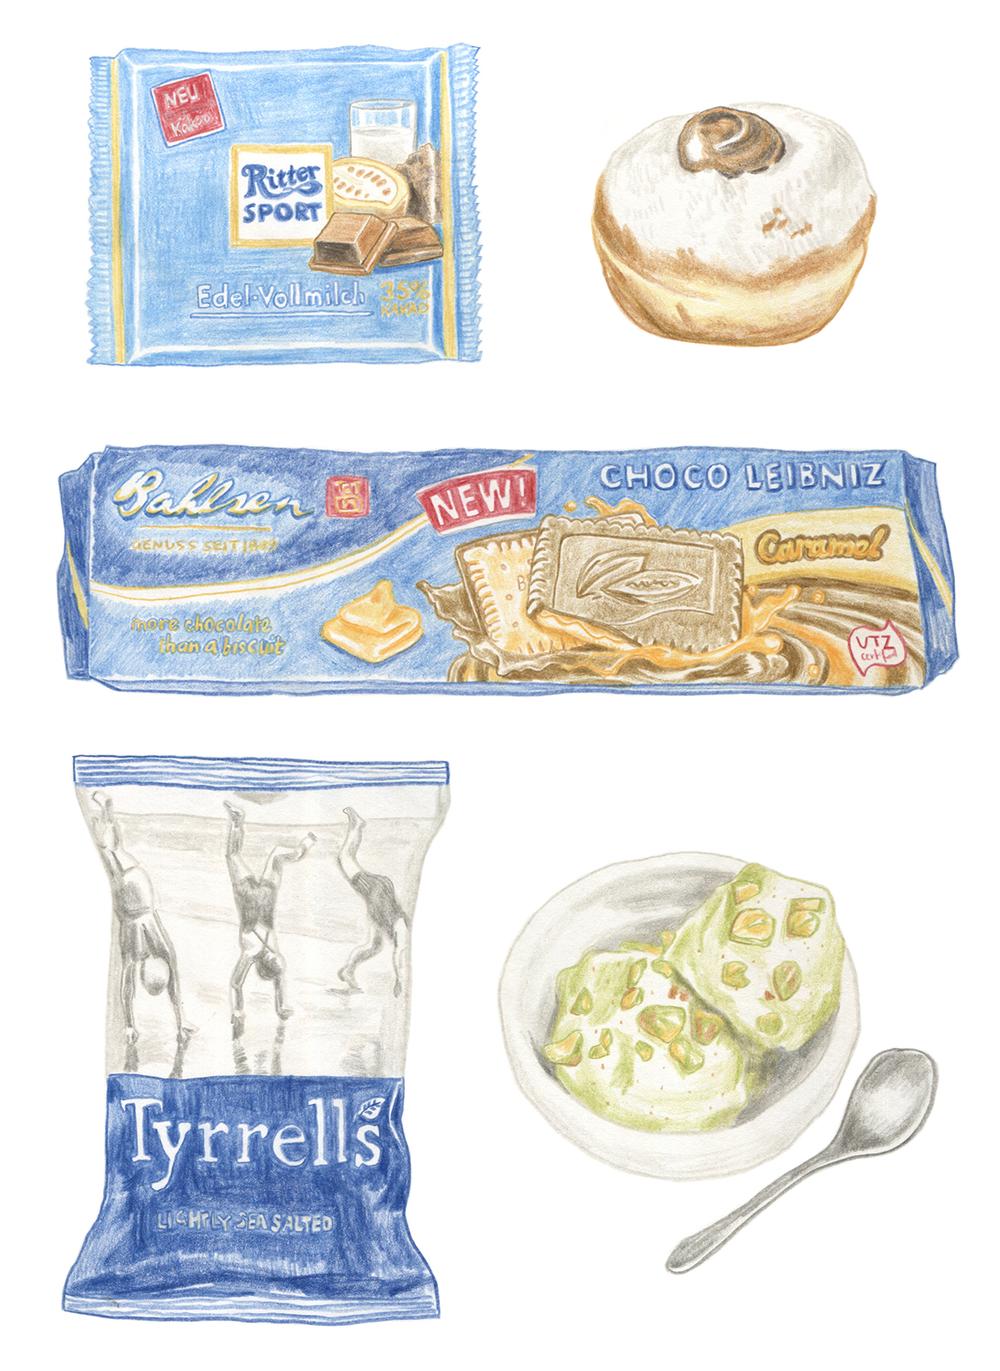 snacks-final.jpg